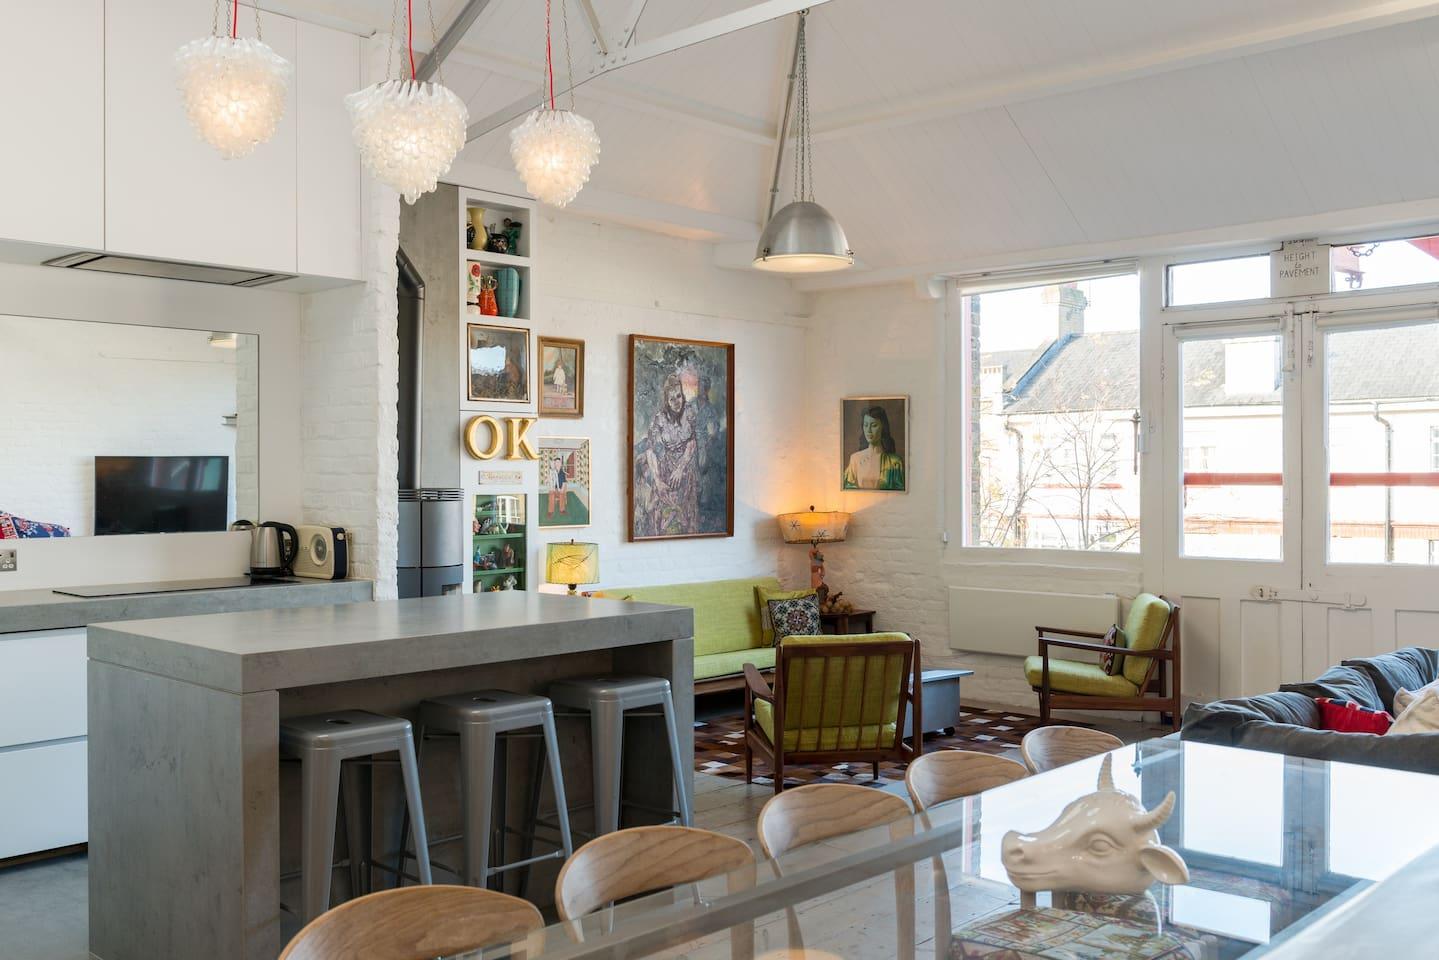 framery loft apartments for rent in london england united kingdom